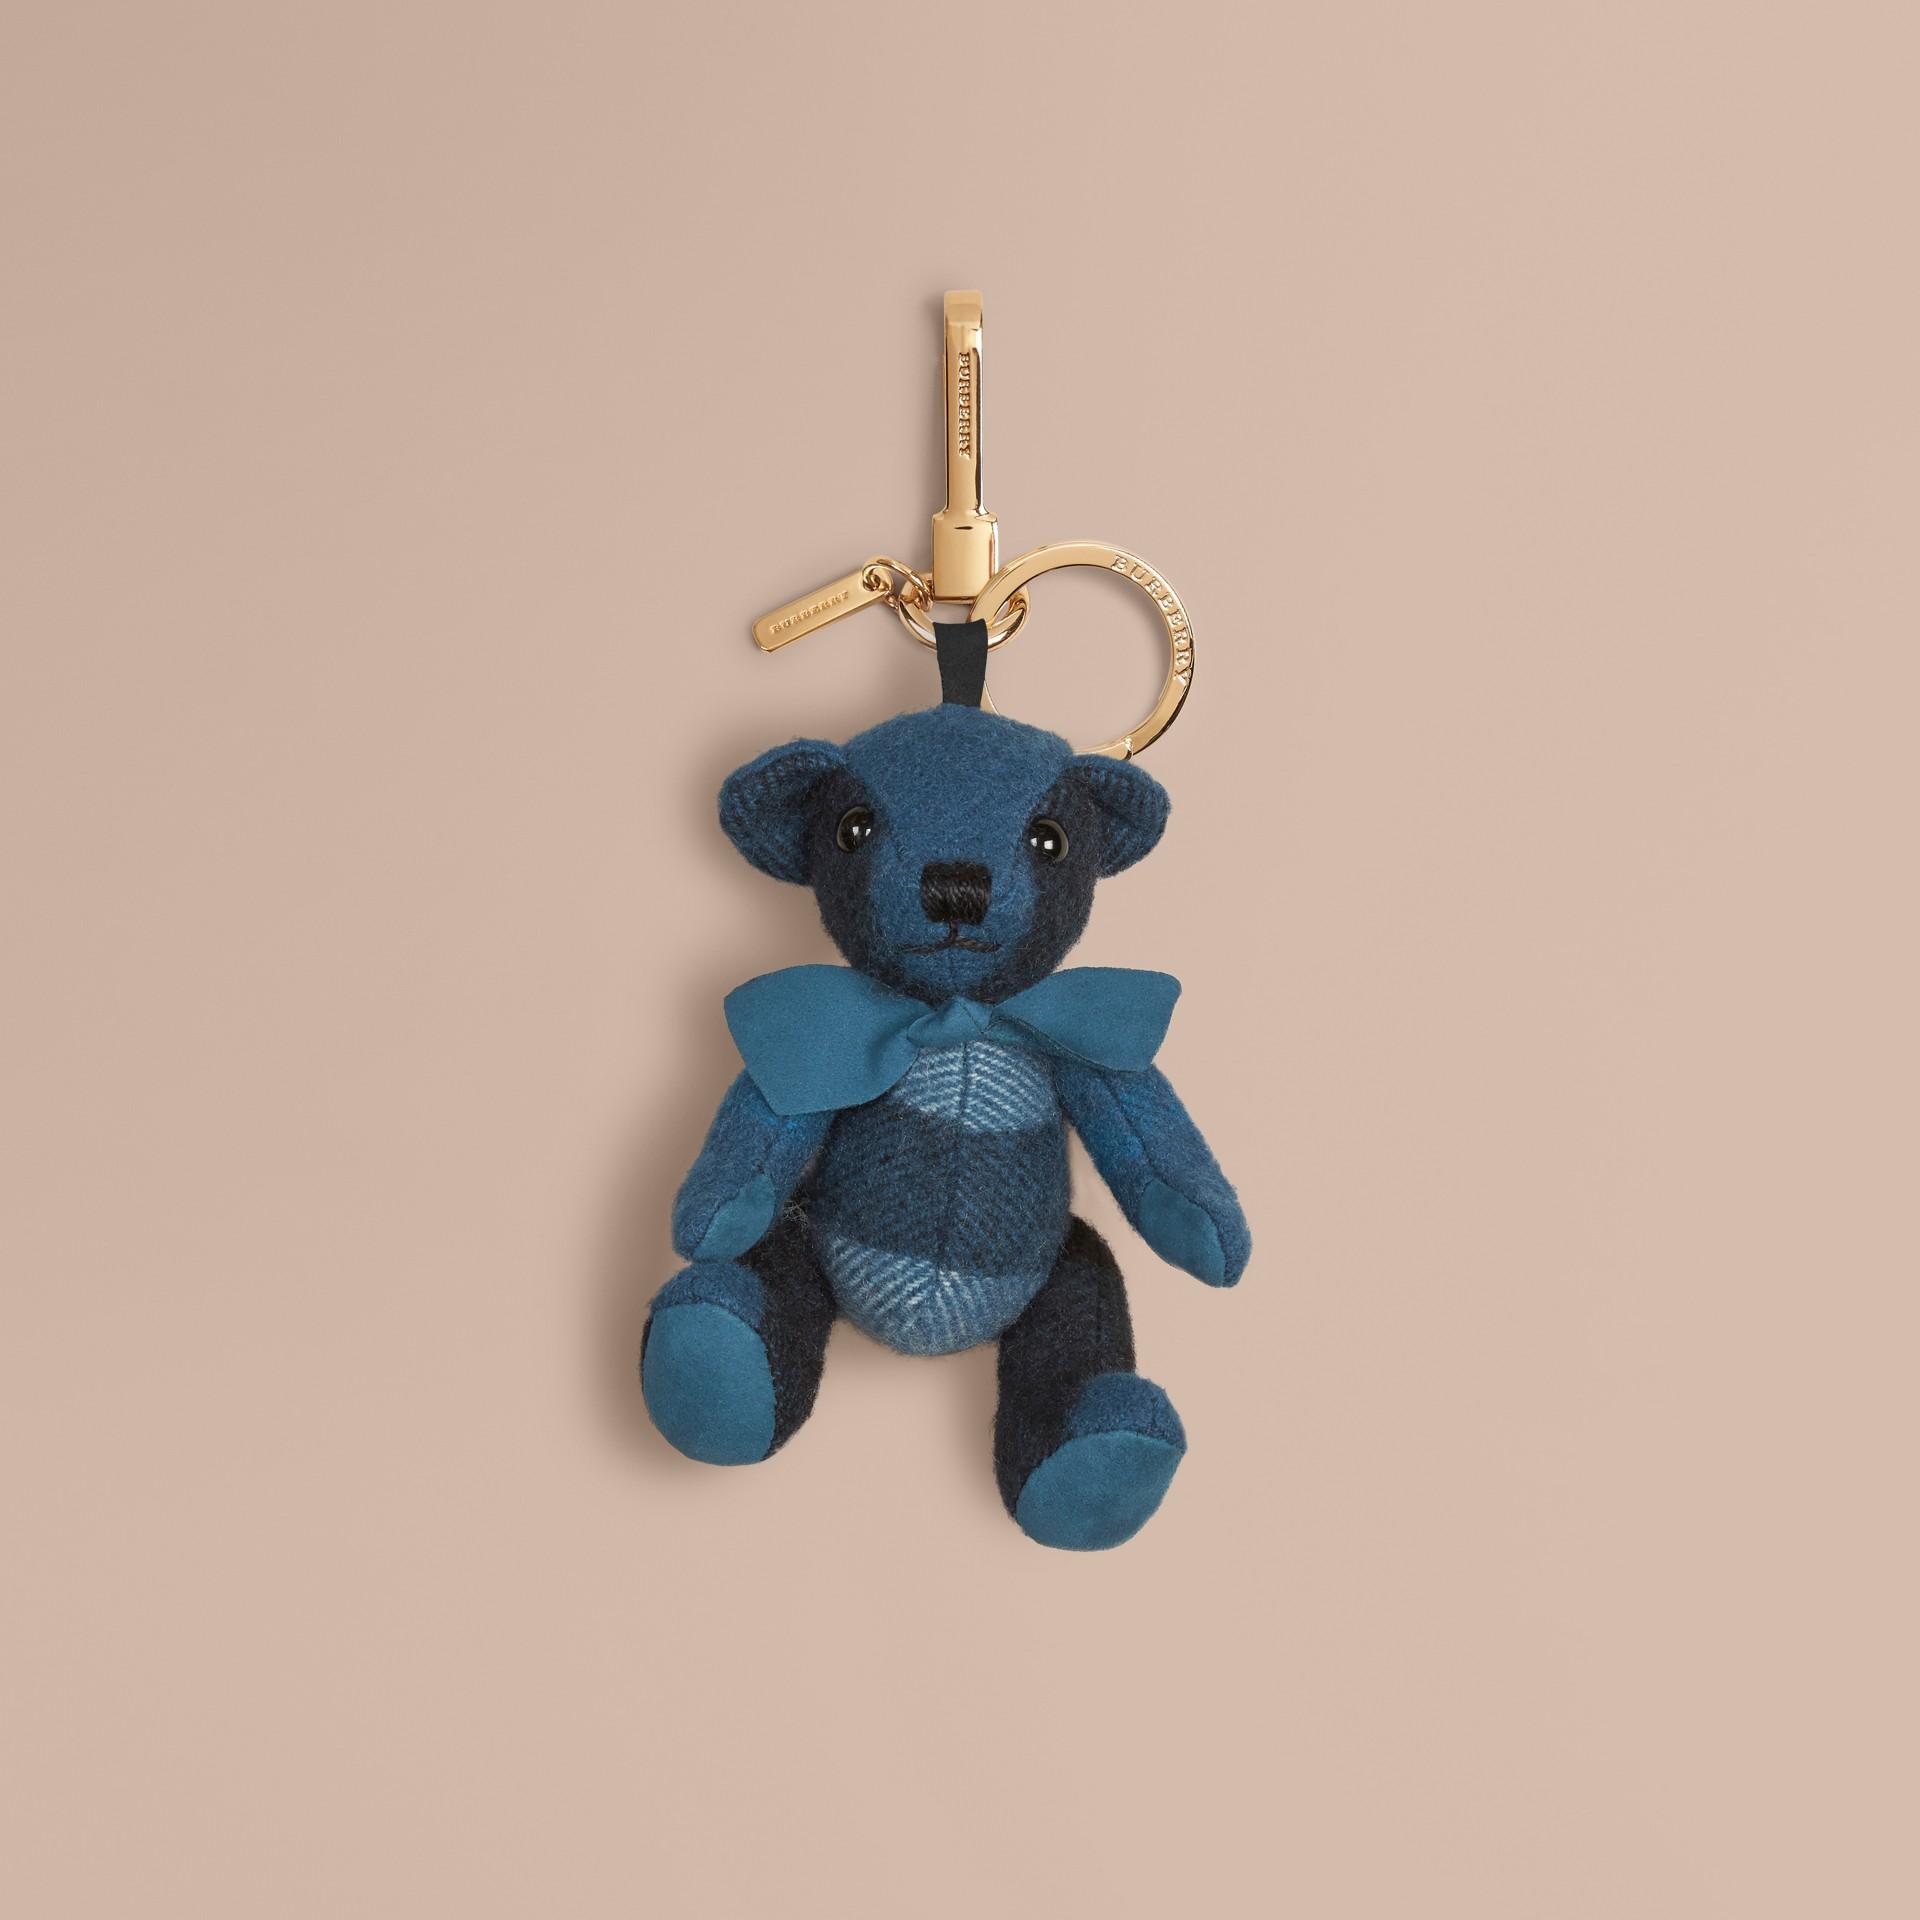 Teddybär-Anhänger aus Kaschmir mit Karomuster Dunkles Aquamarin - Galerie-Bild 1